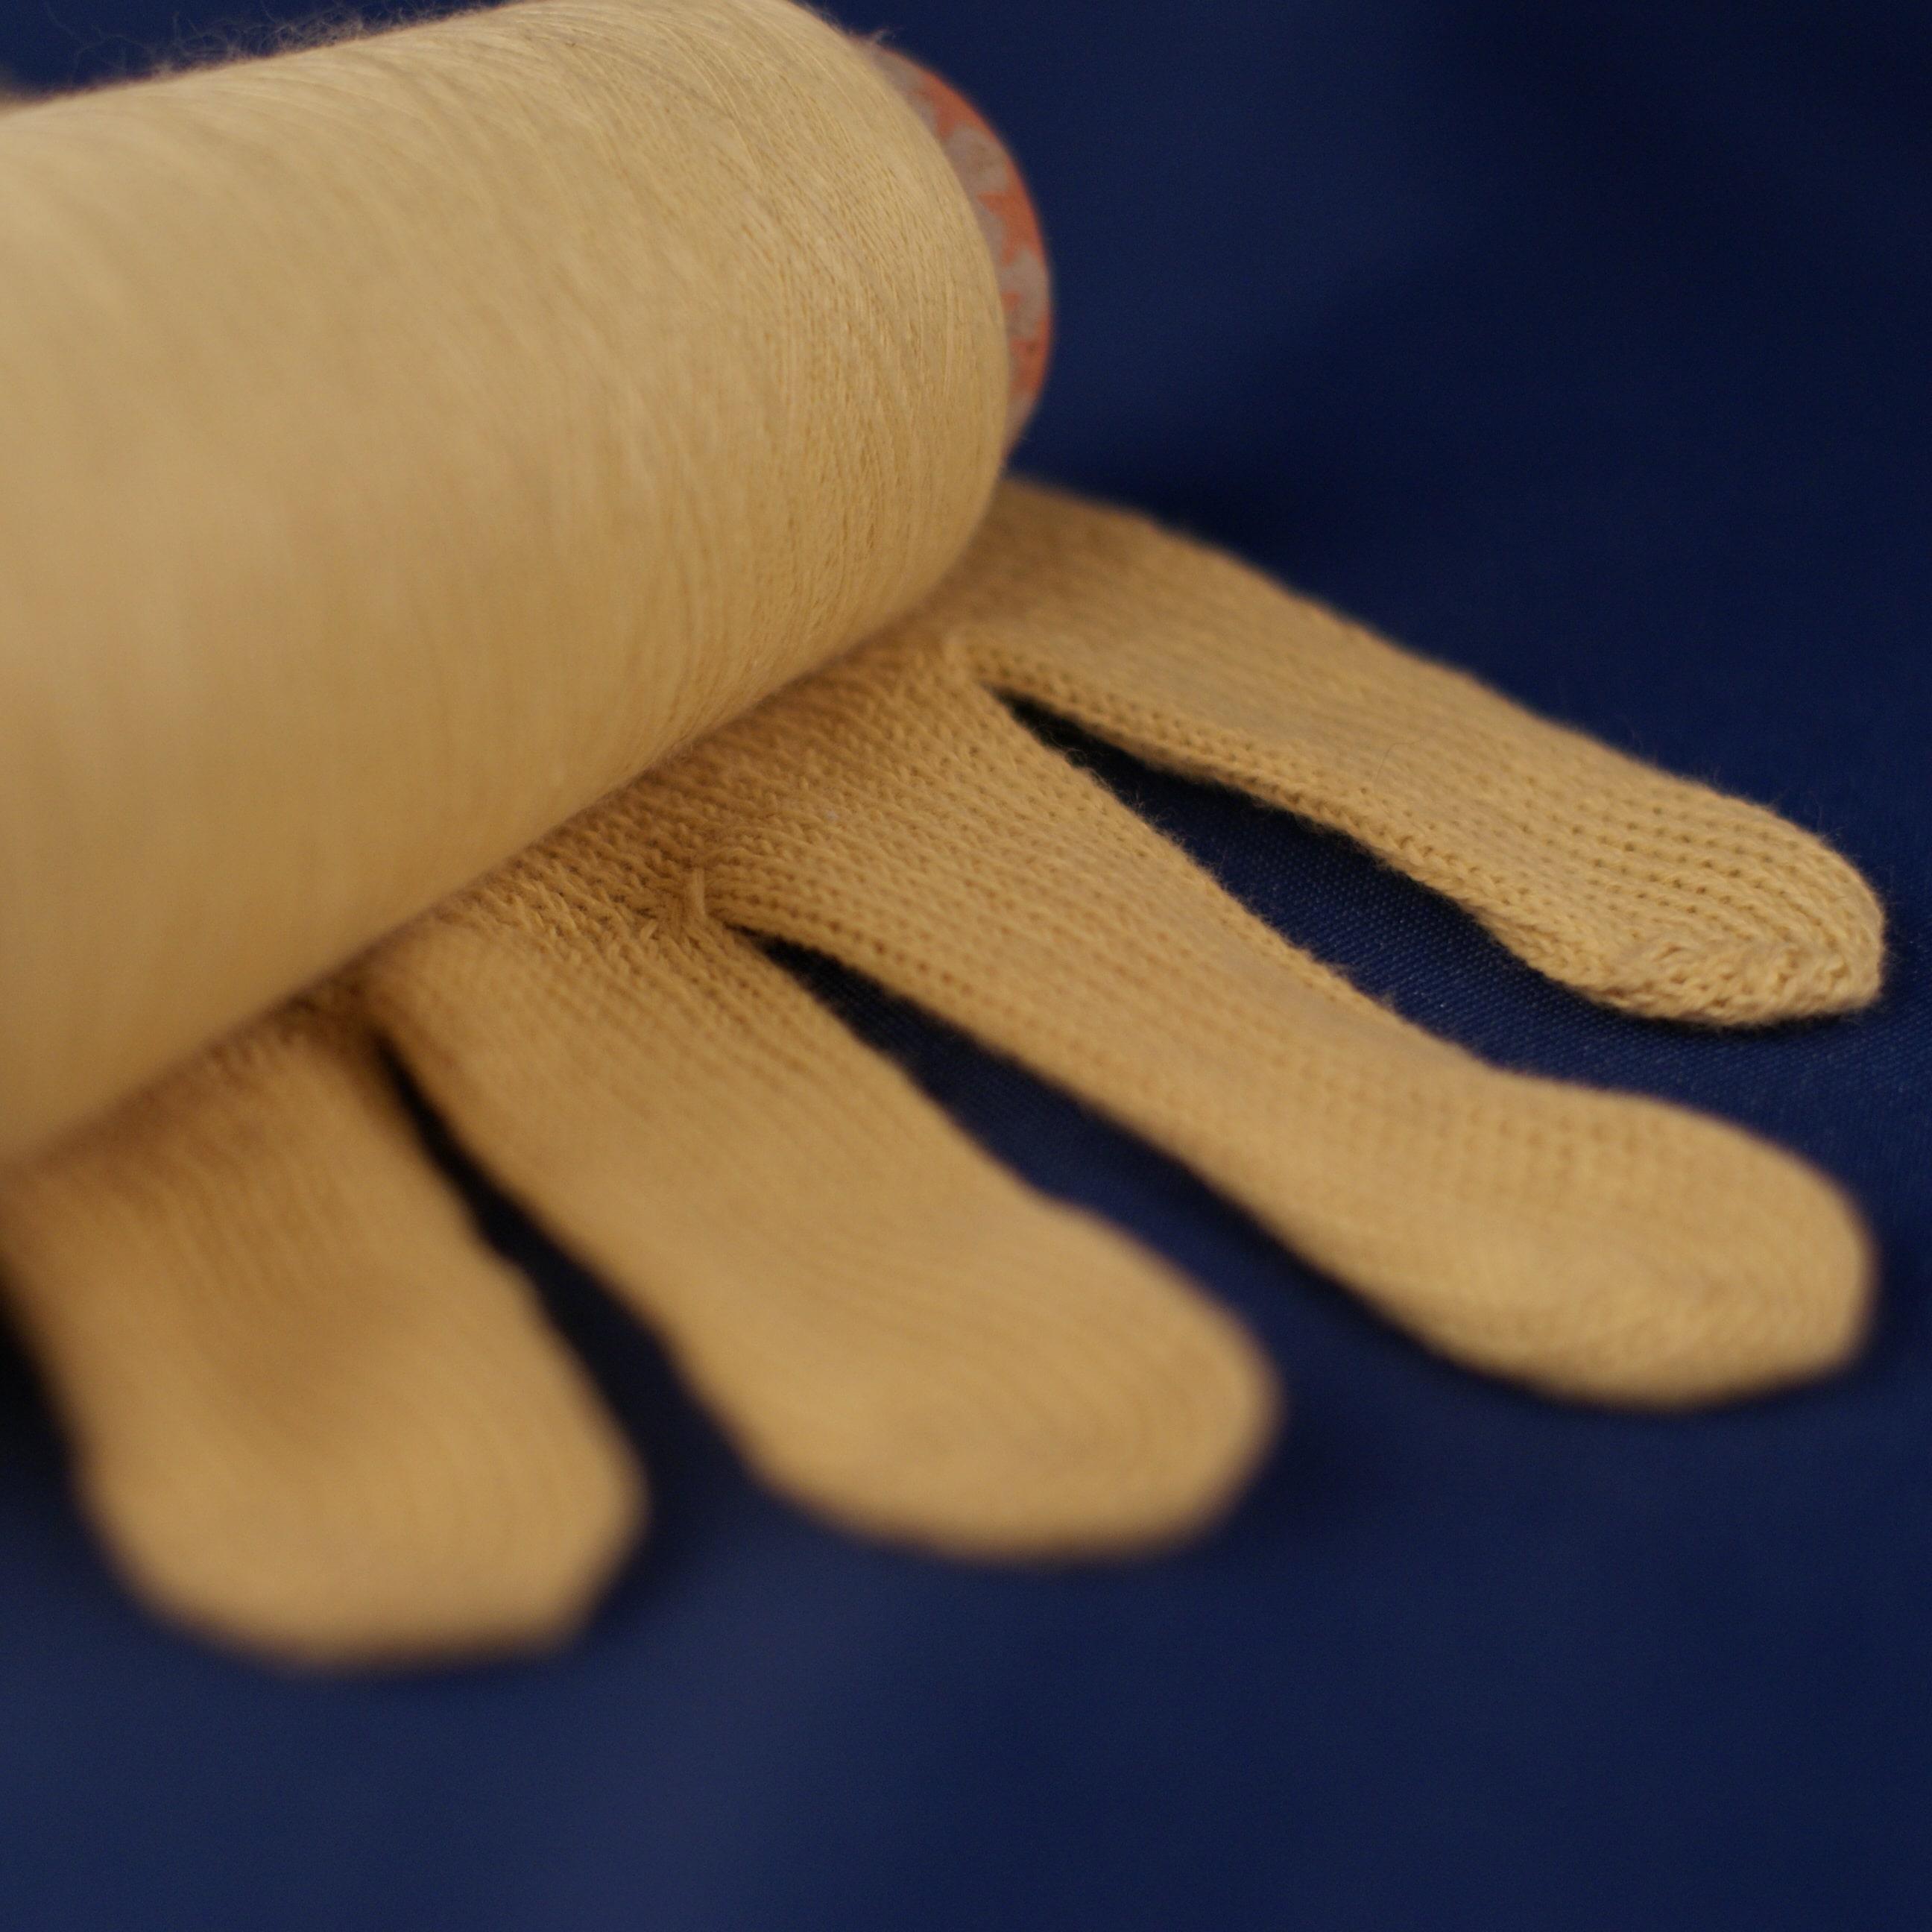 Aramid yarn and glove